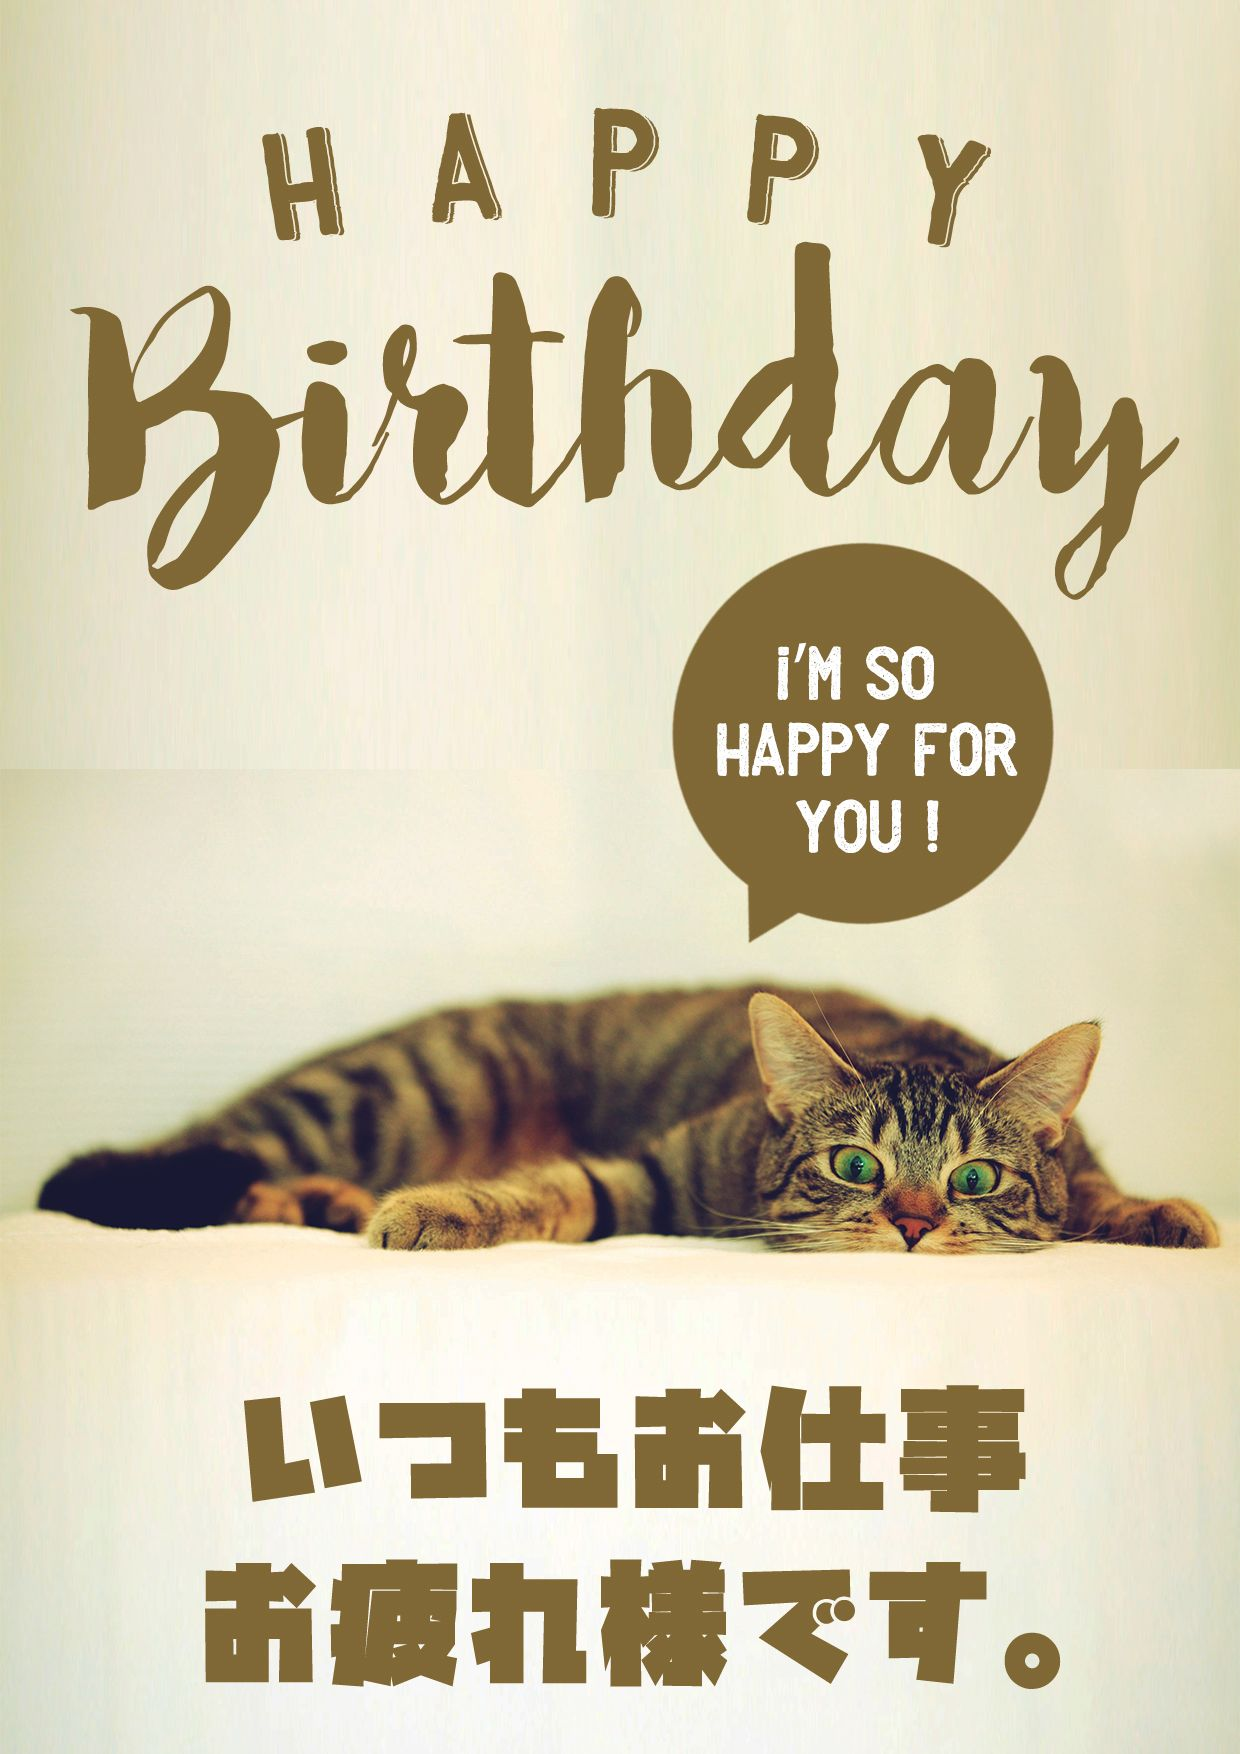 Https Www Waraeru Birthday Photo Com Funny Animals Freedata 60 Jpg 2020 おめでとう 画像 面白い誕生日 バースデー画像